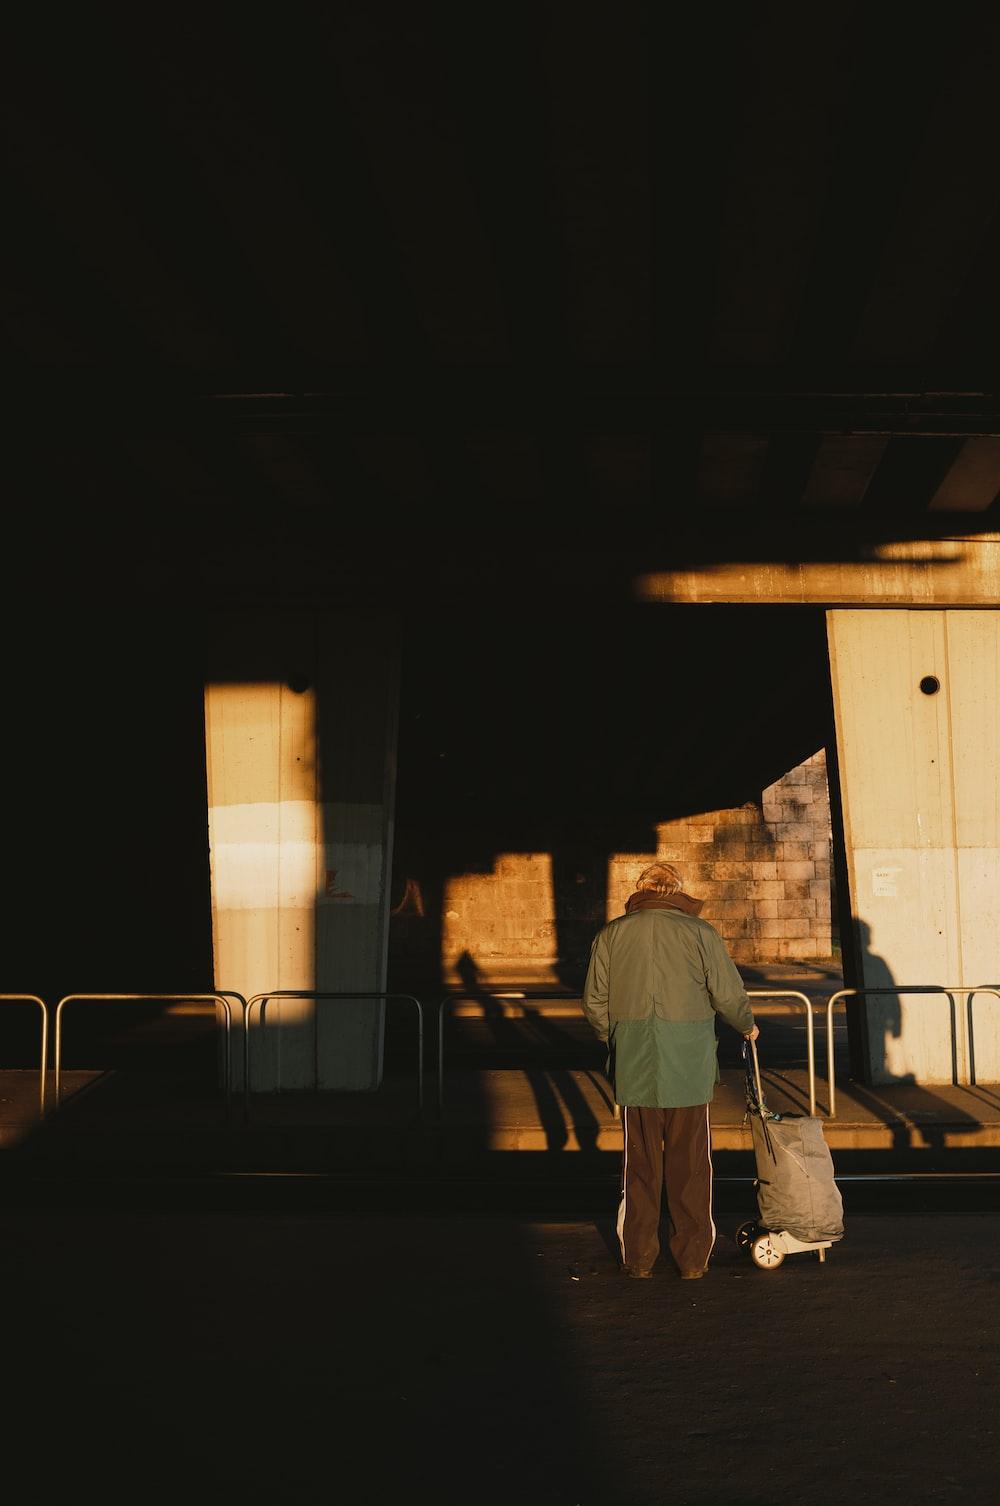 man in gray shirt and gray pants walking on sidewalk during daytime